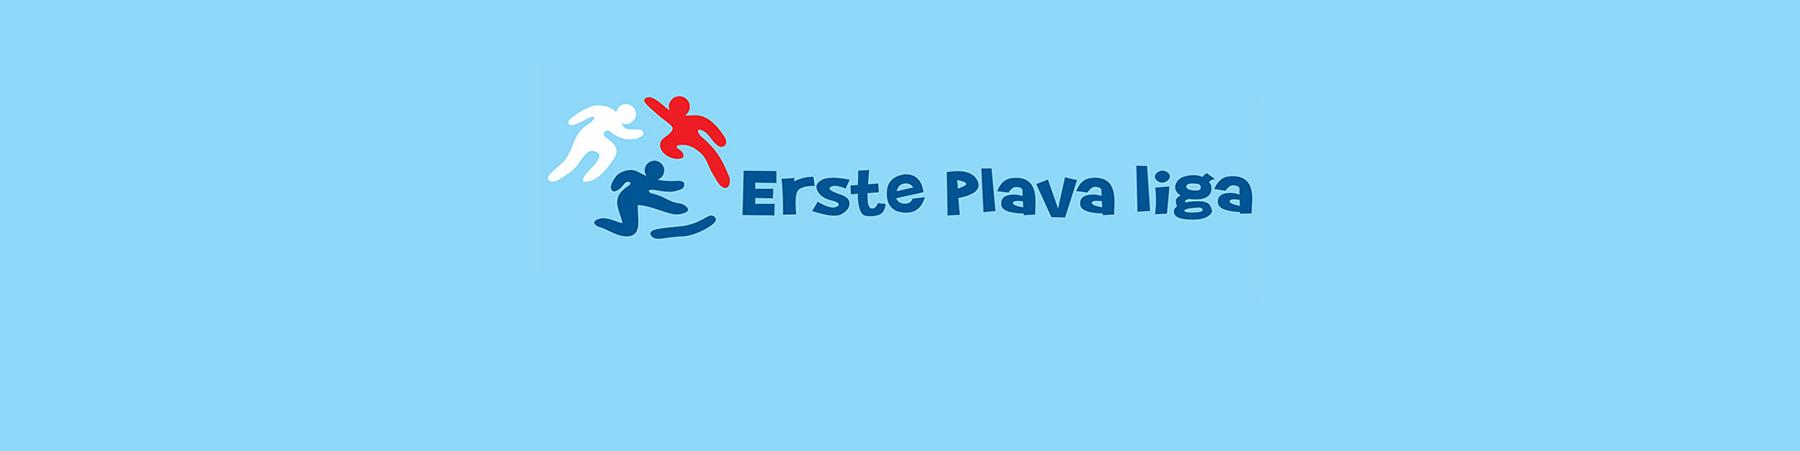 Slider-Erste-Plava-liga